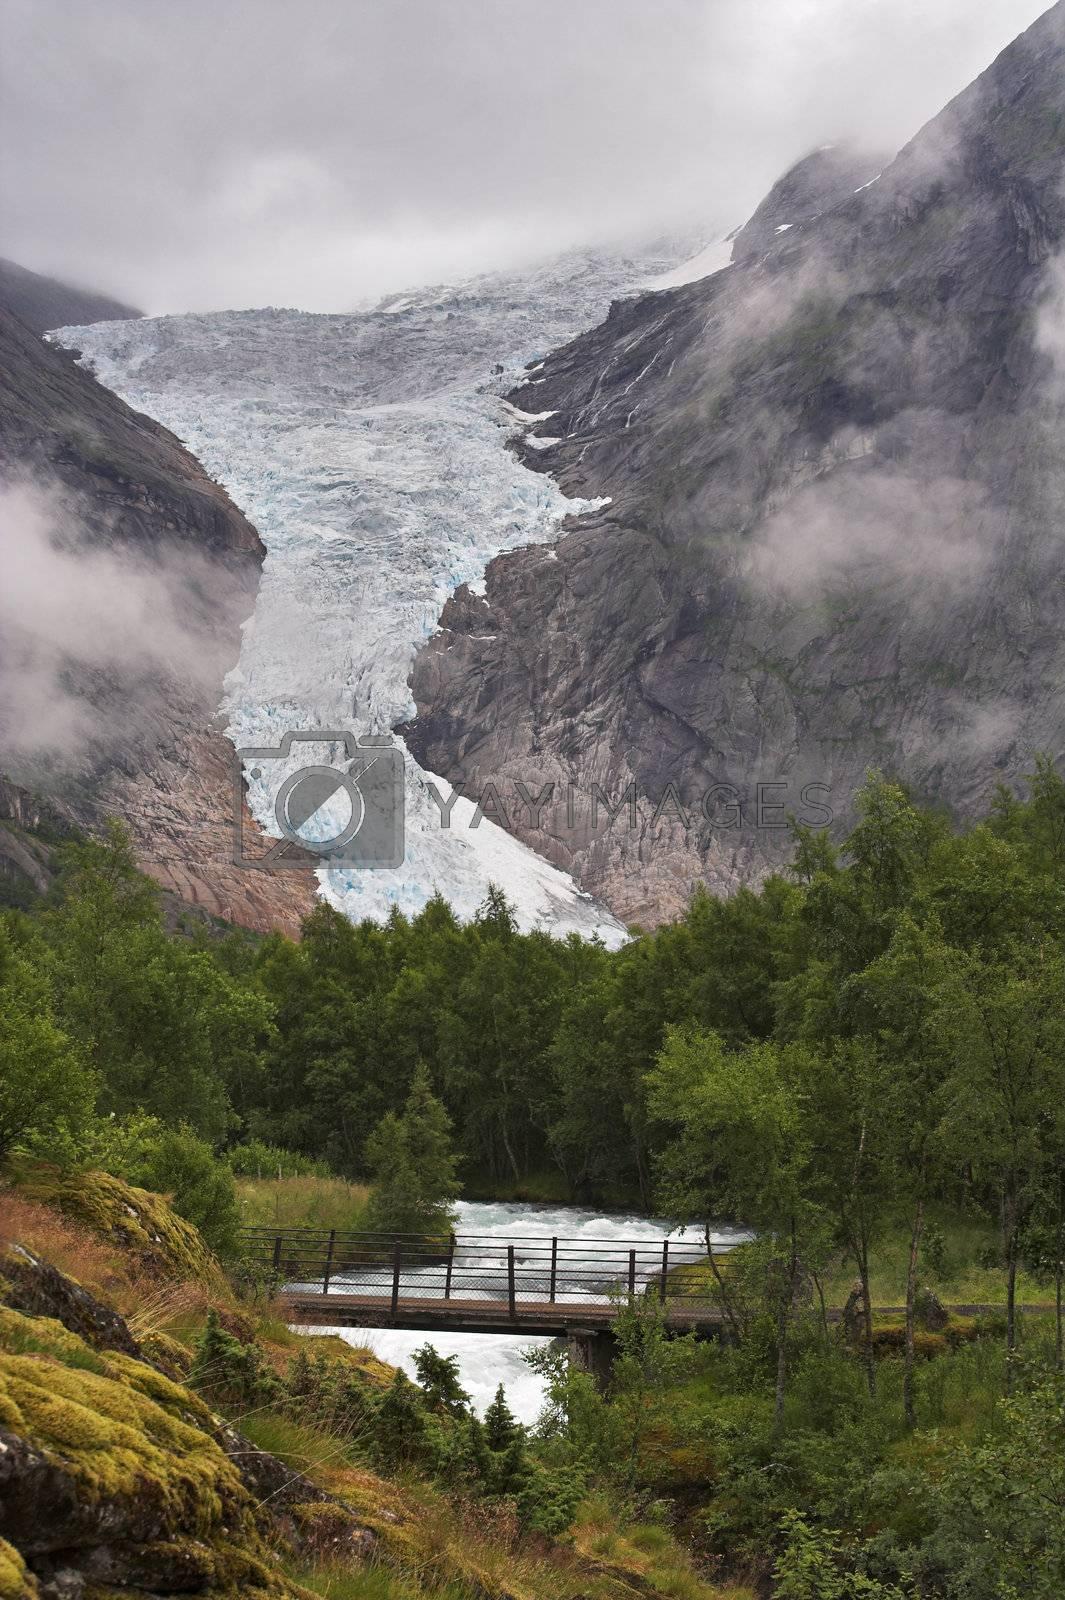 Bridge over the stream at Briksdal glacier by MikLav